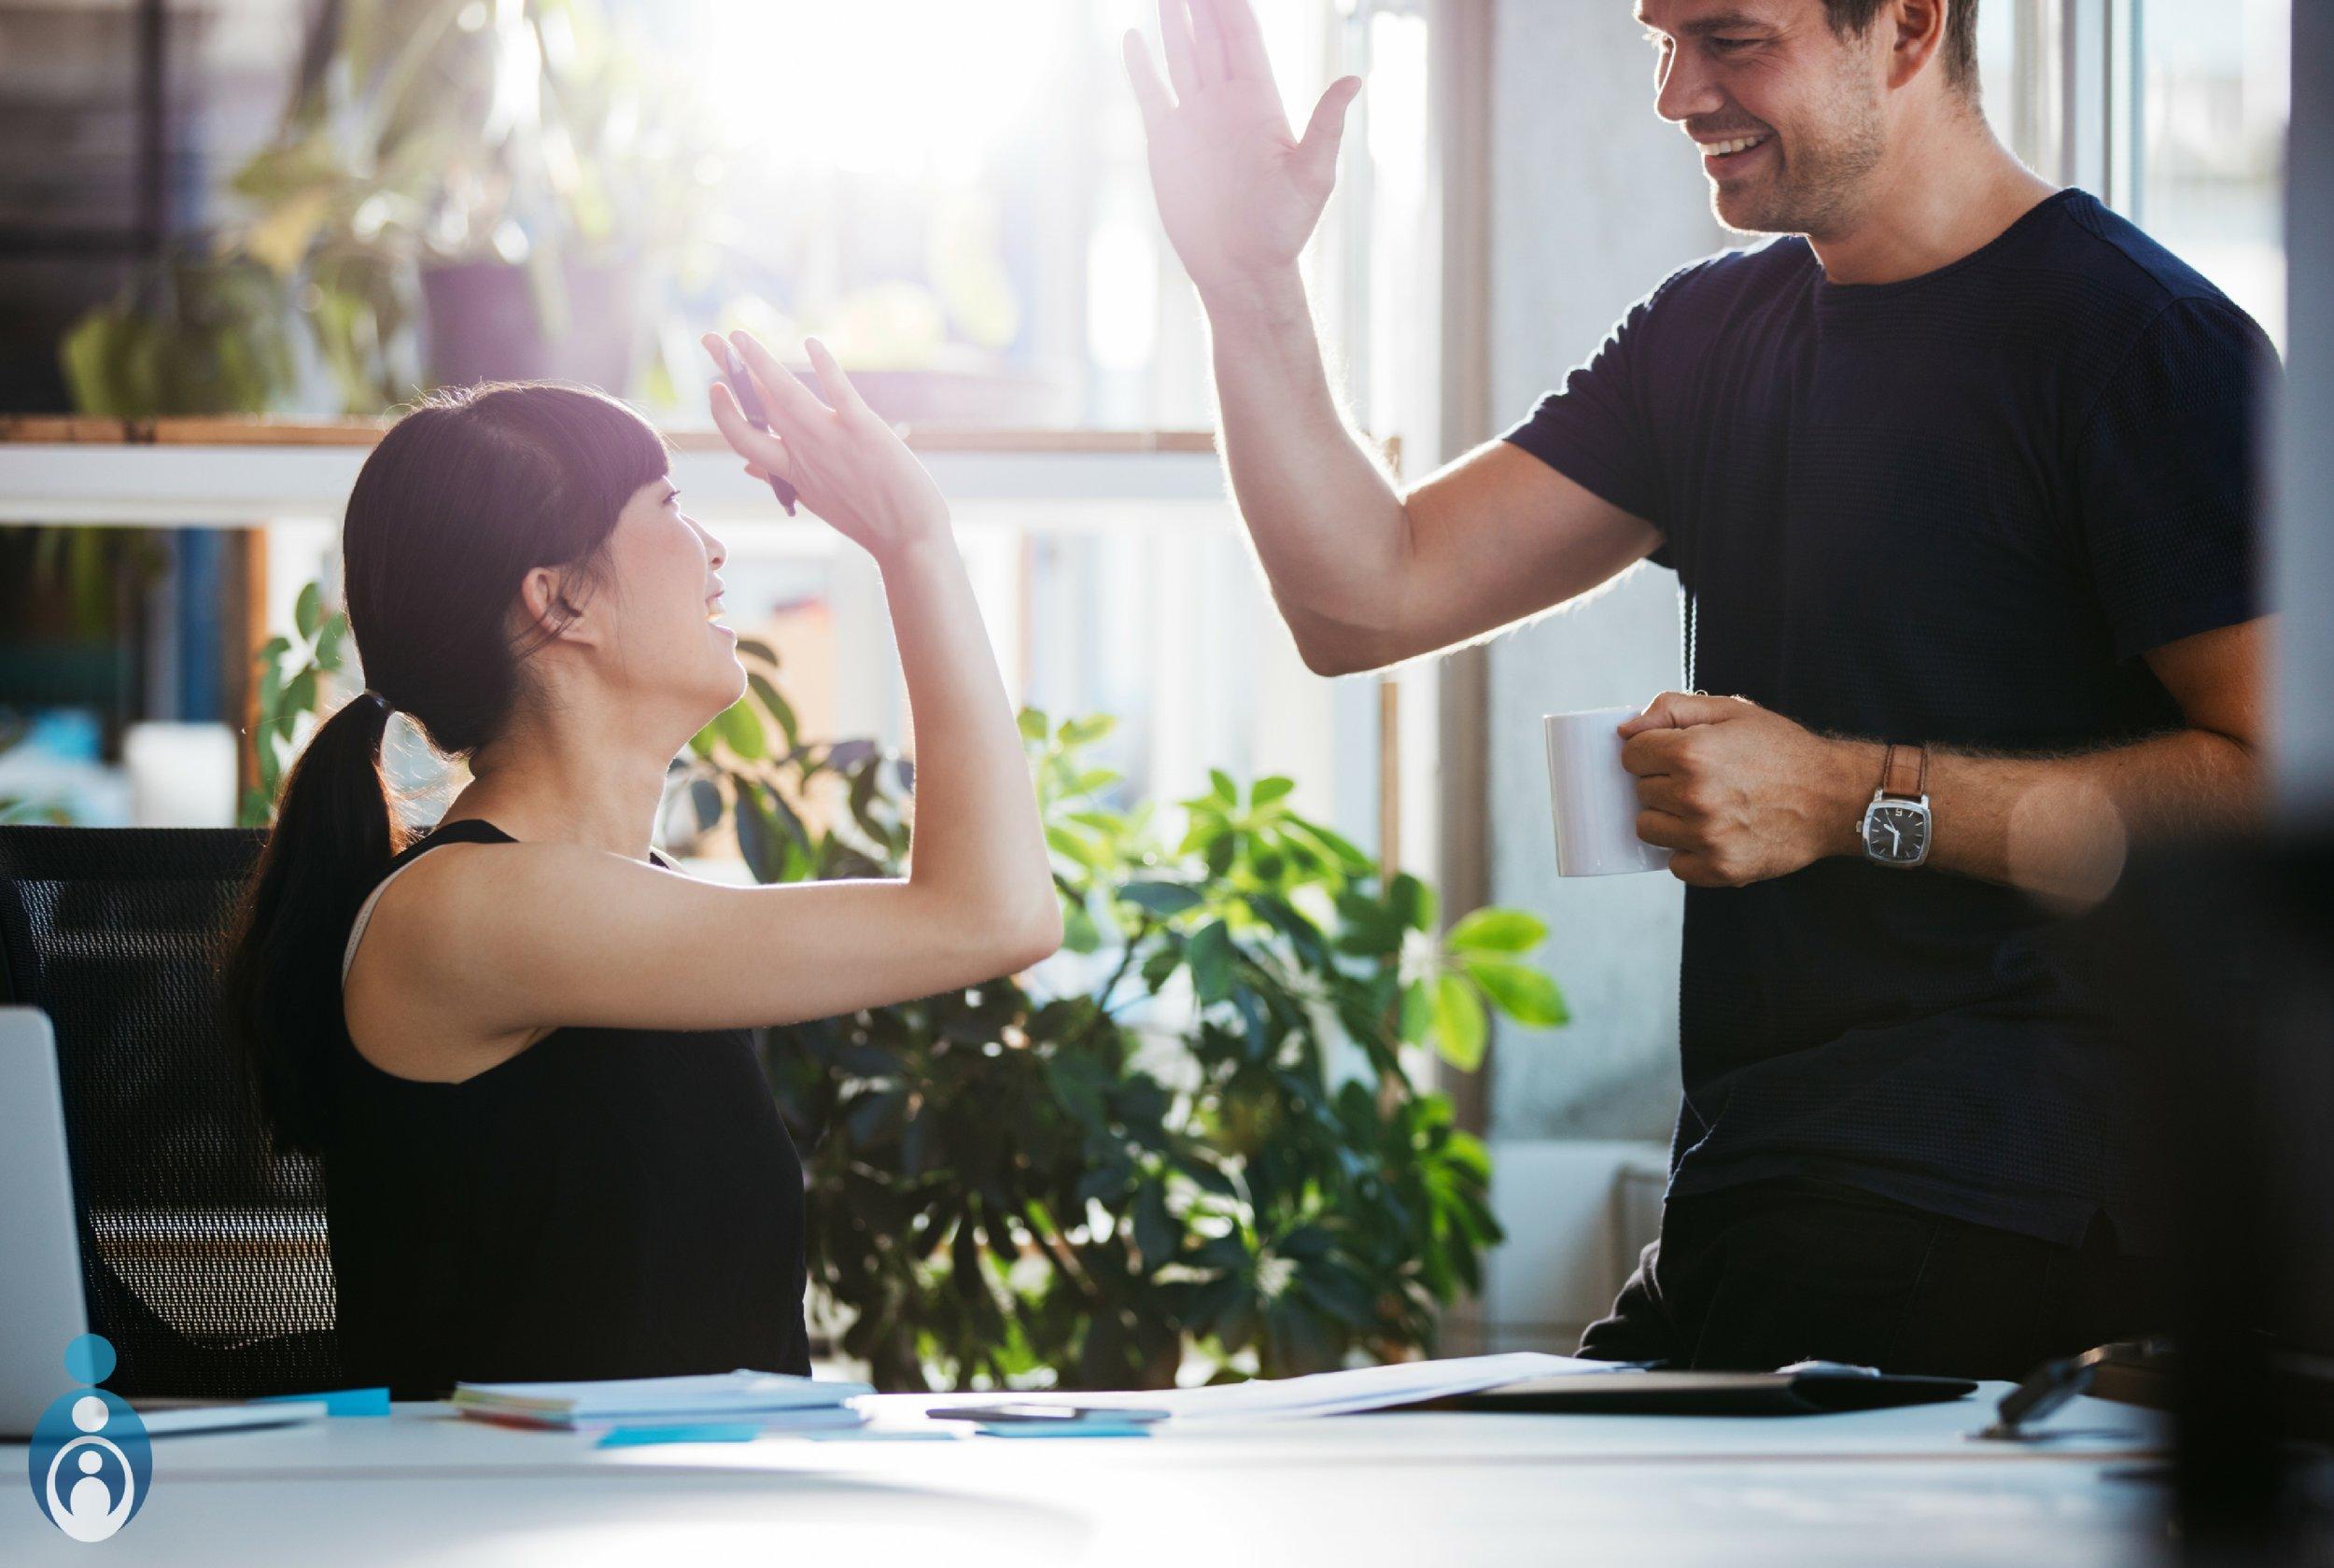 cheerleader-spouse-americas-family-coaches-marriage-blog